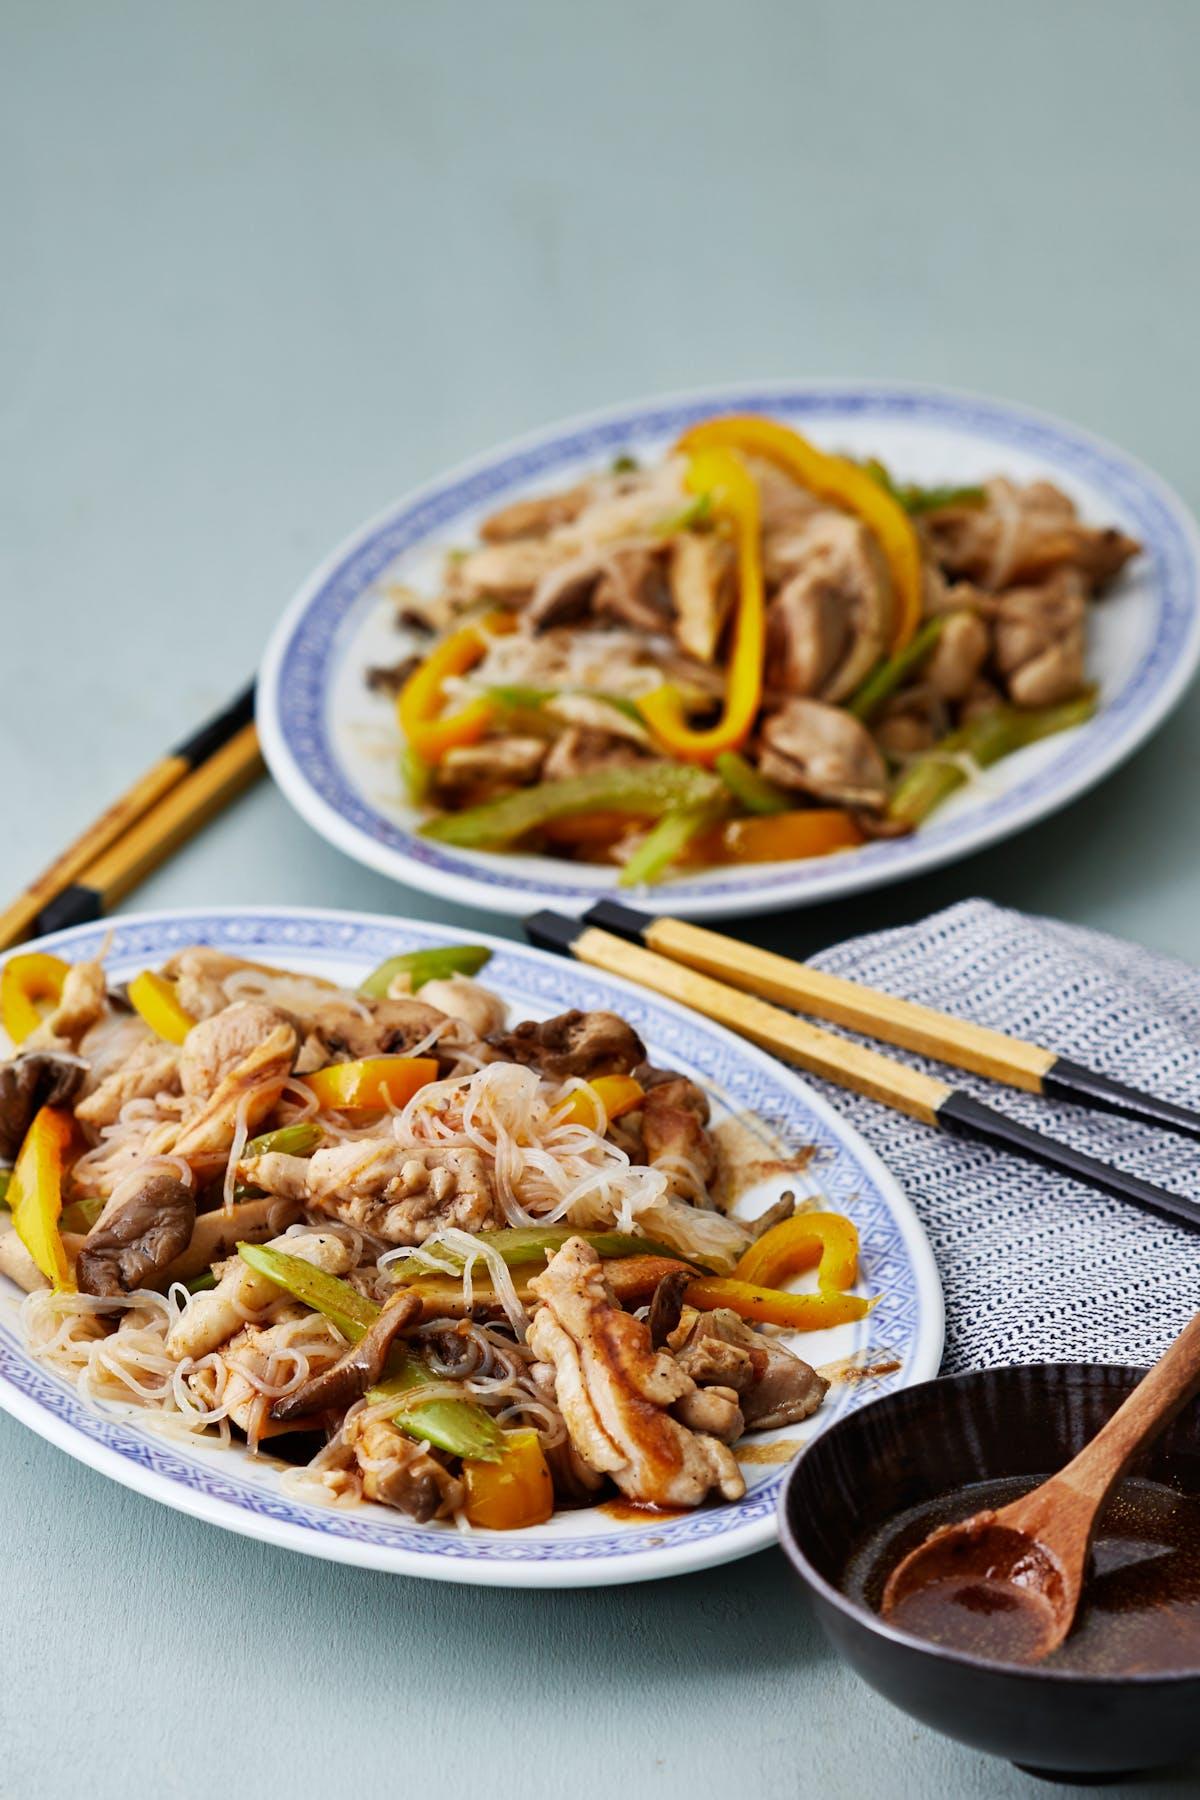 20 Shirataki Noodle Recipes That Seem Too Good To Be True